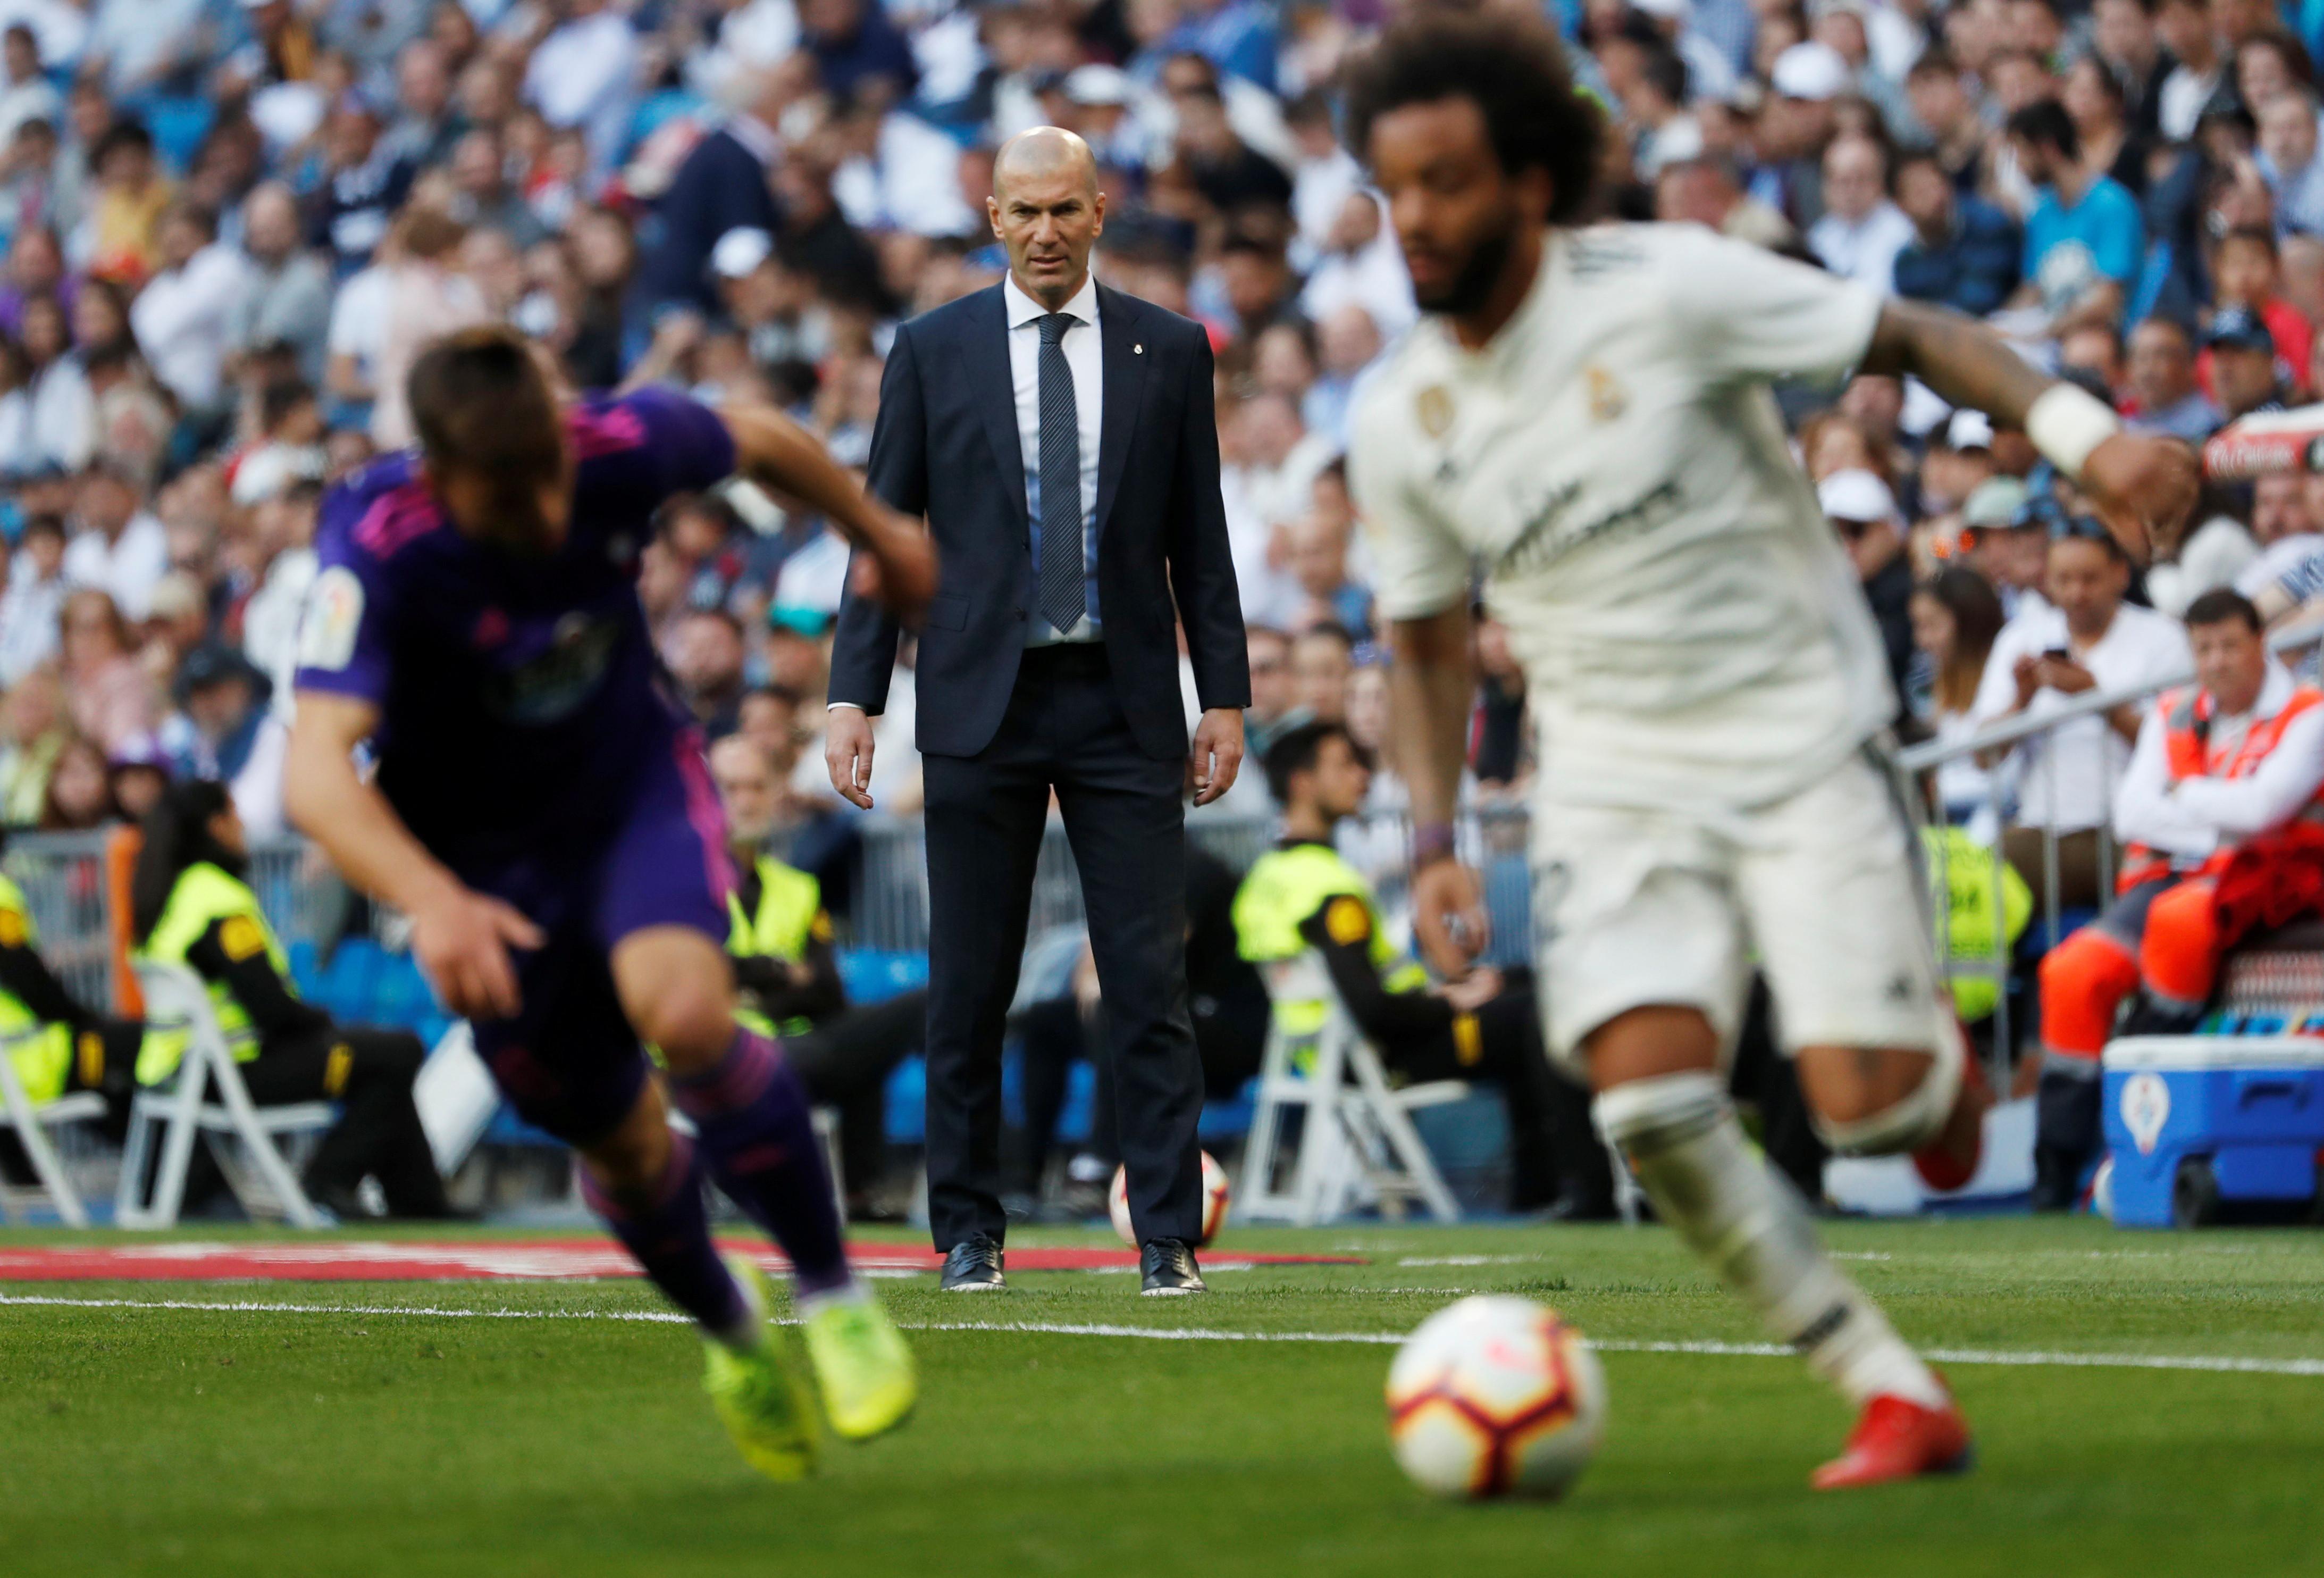 Na volta de Zidane, Real vence o Celta com gol de Isco